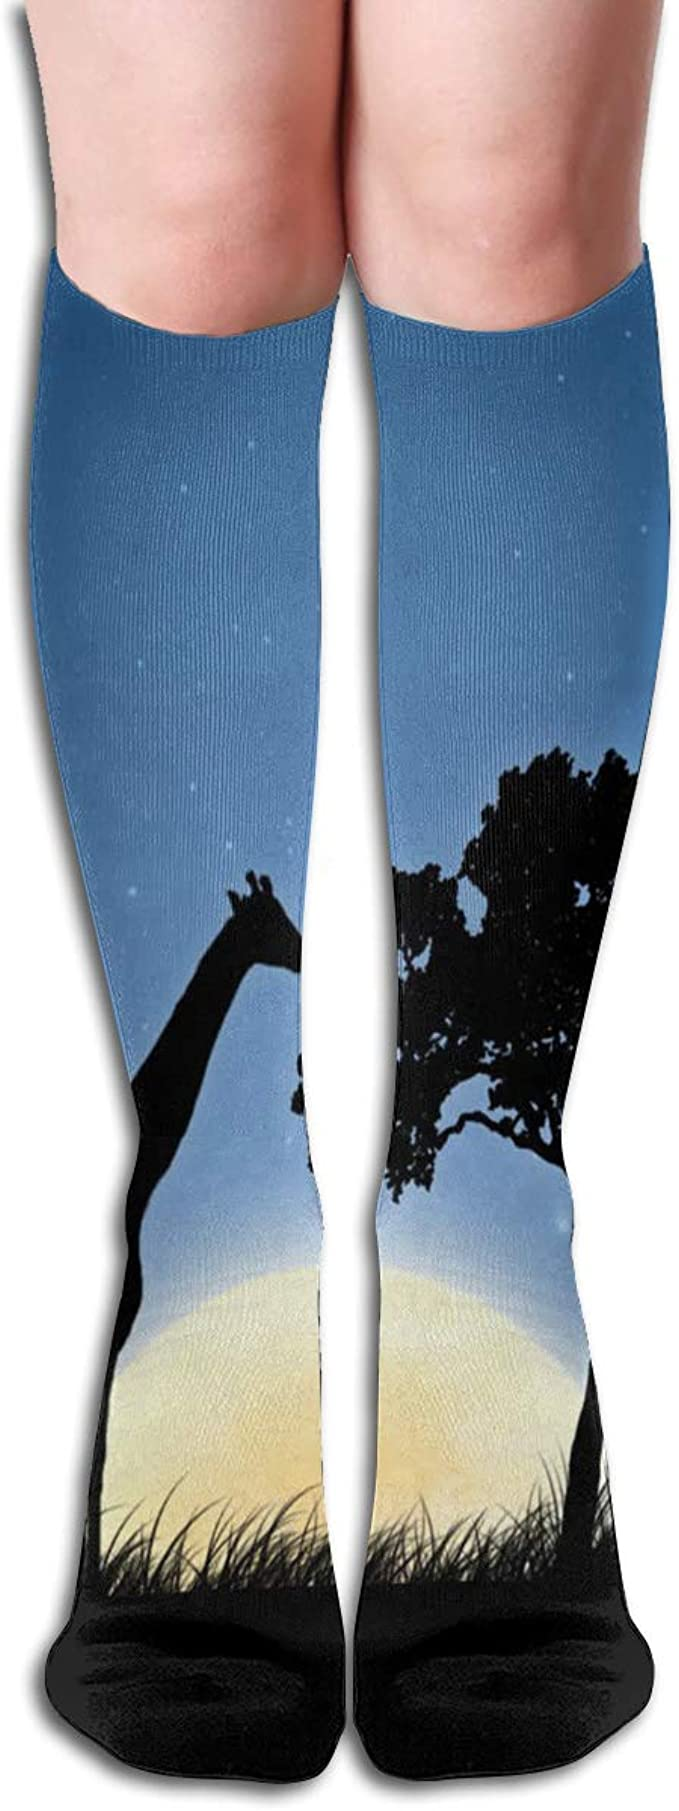 Women Socks Over Knee Giraffe Night Winter Amazing For Holiday